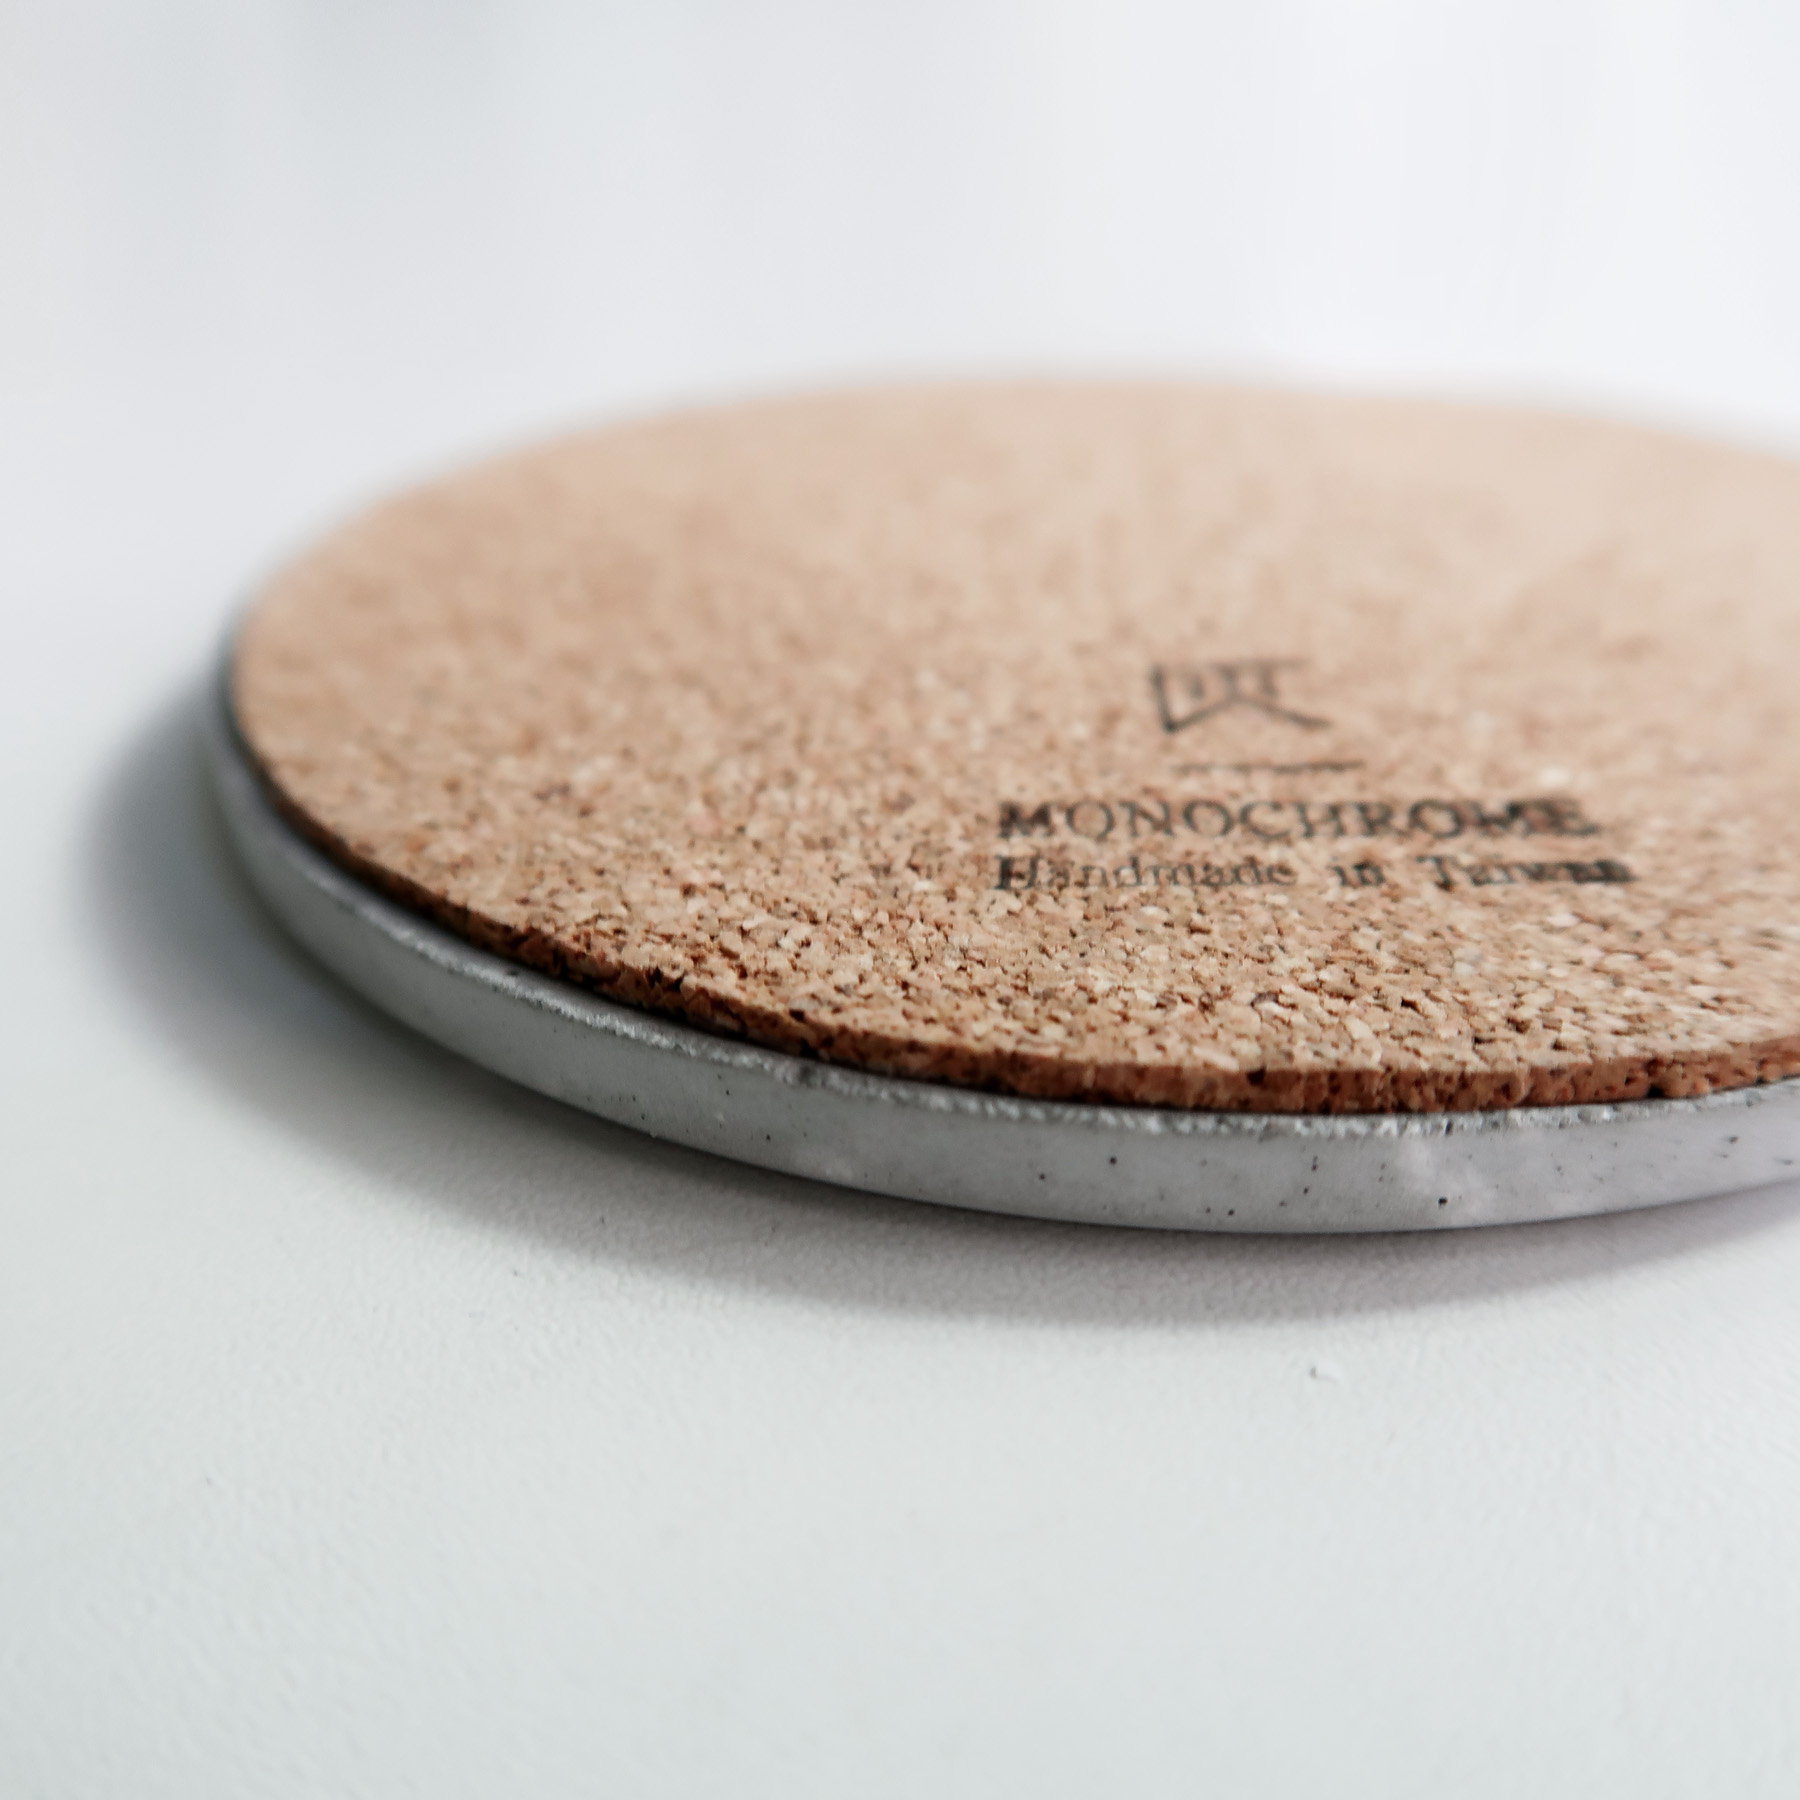 Concrete Design 曙光金線倒角設計水泥吸水圓墊・杯墊・飾品盤 - 軟木底墊